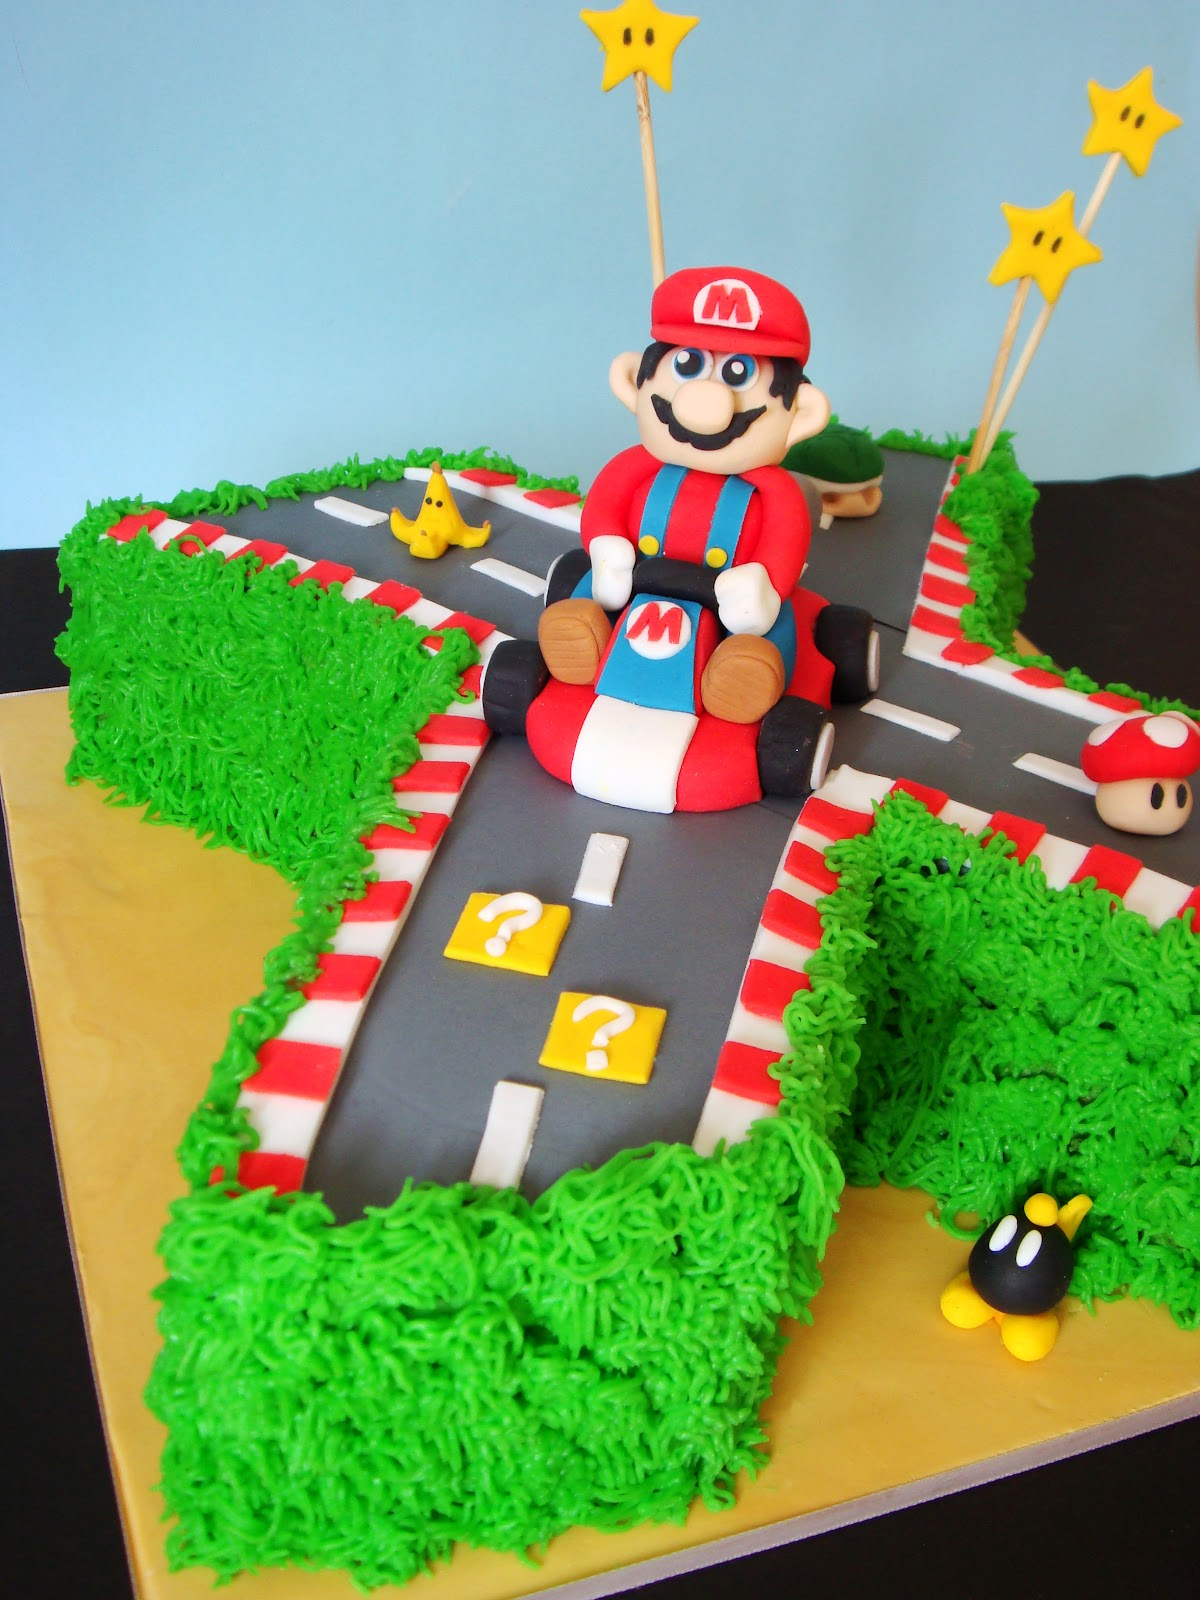 Mario kart cake pictures